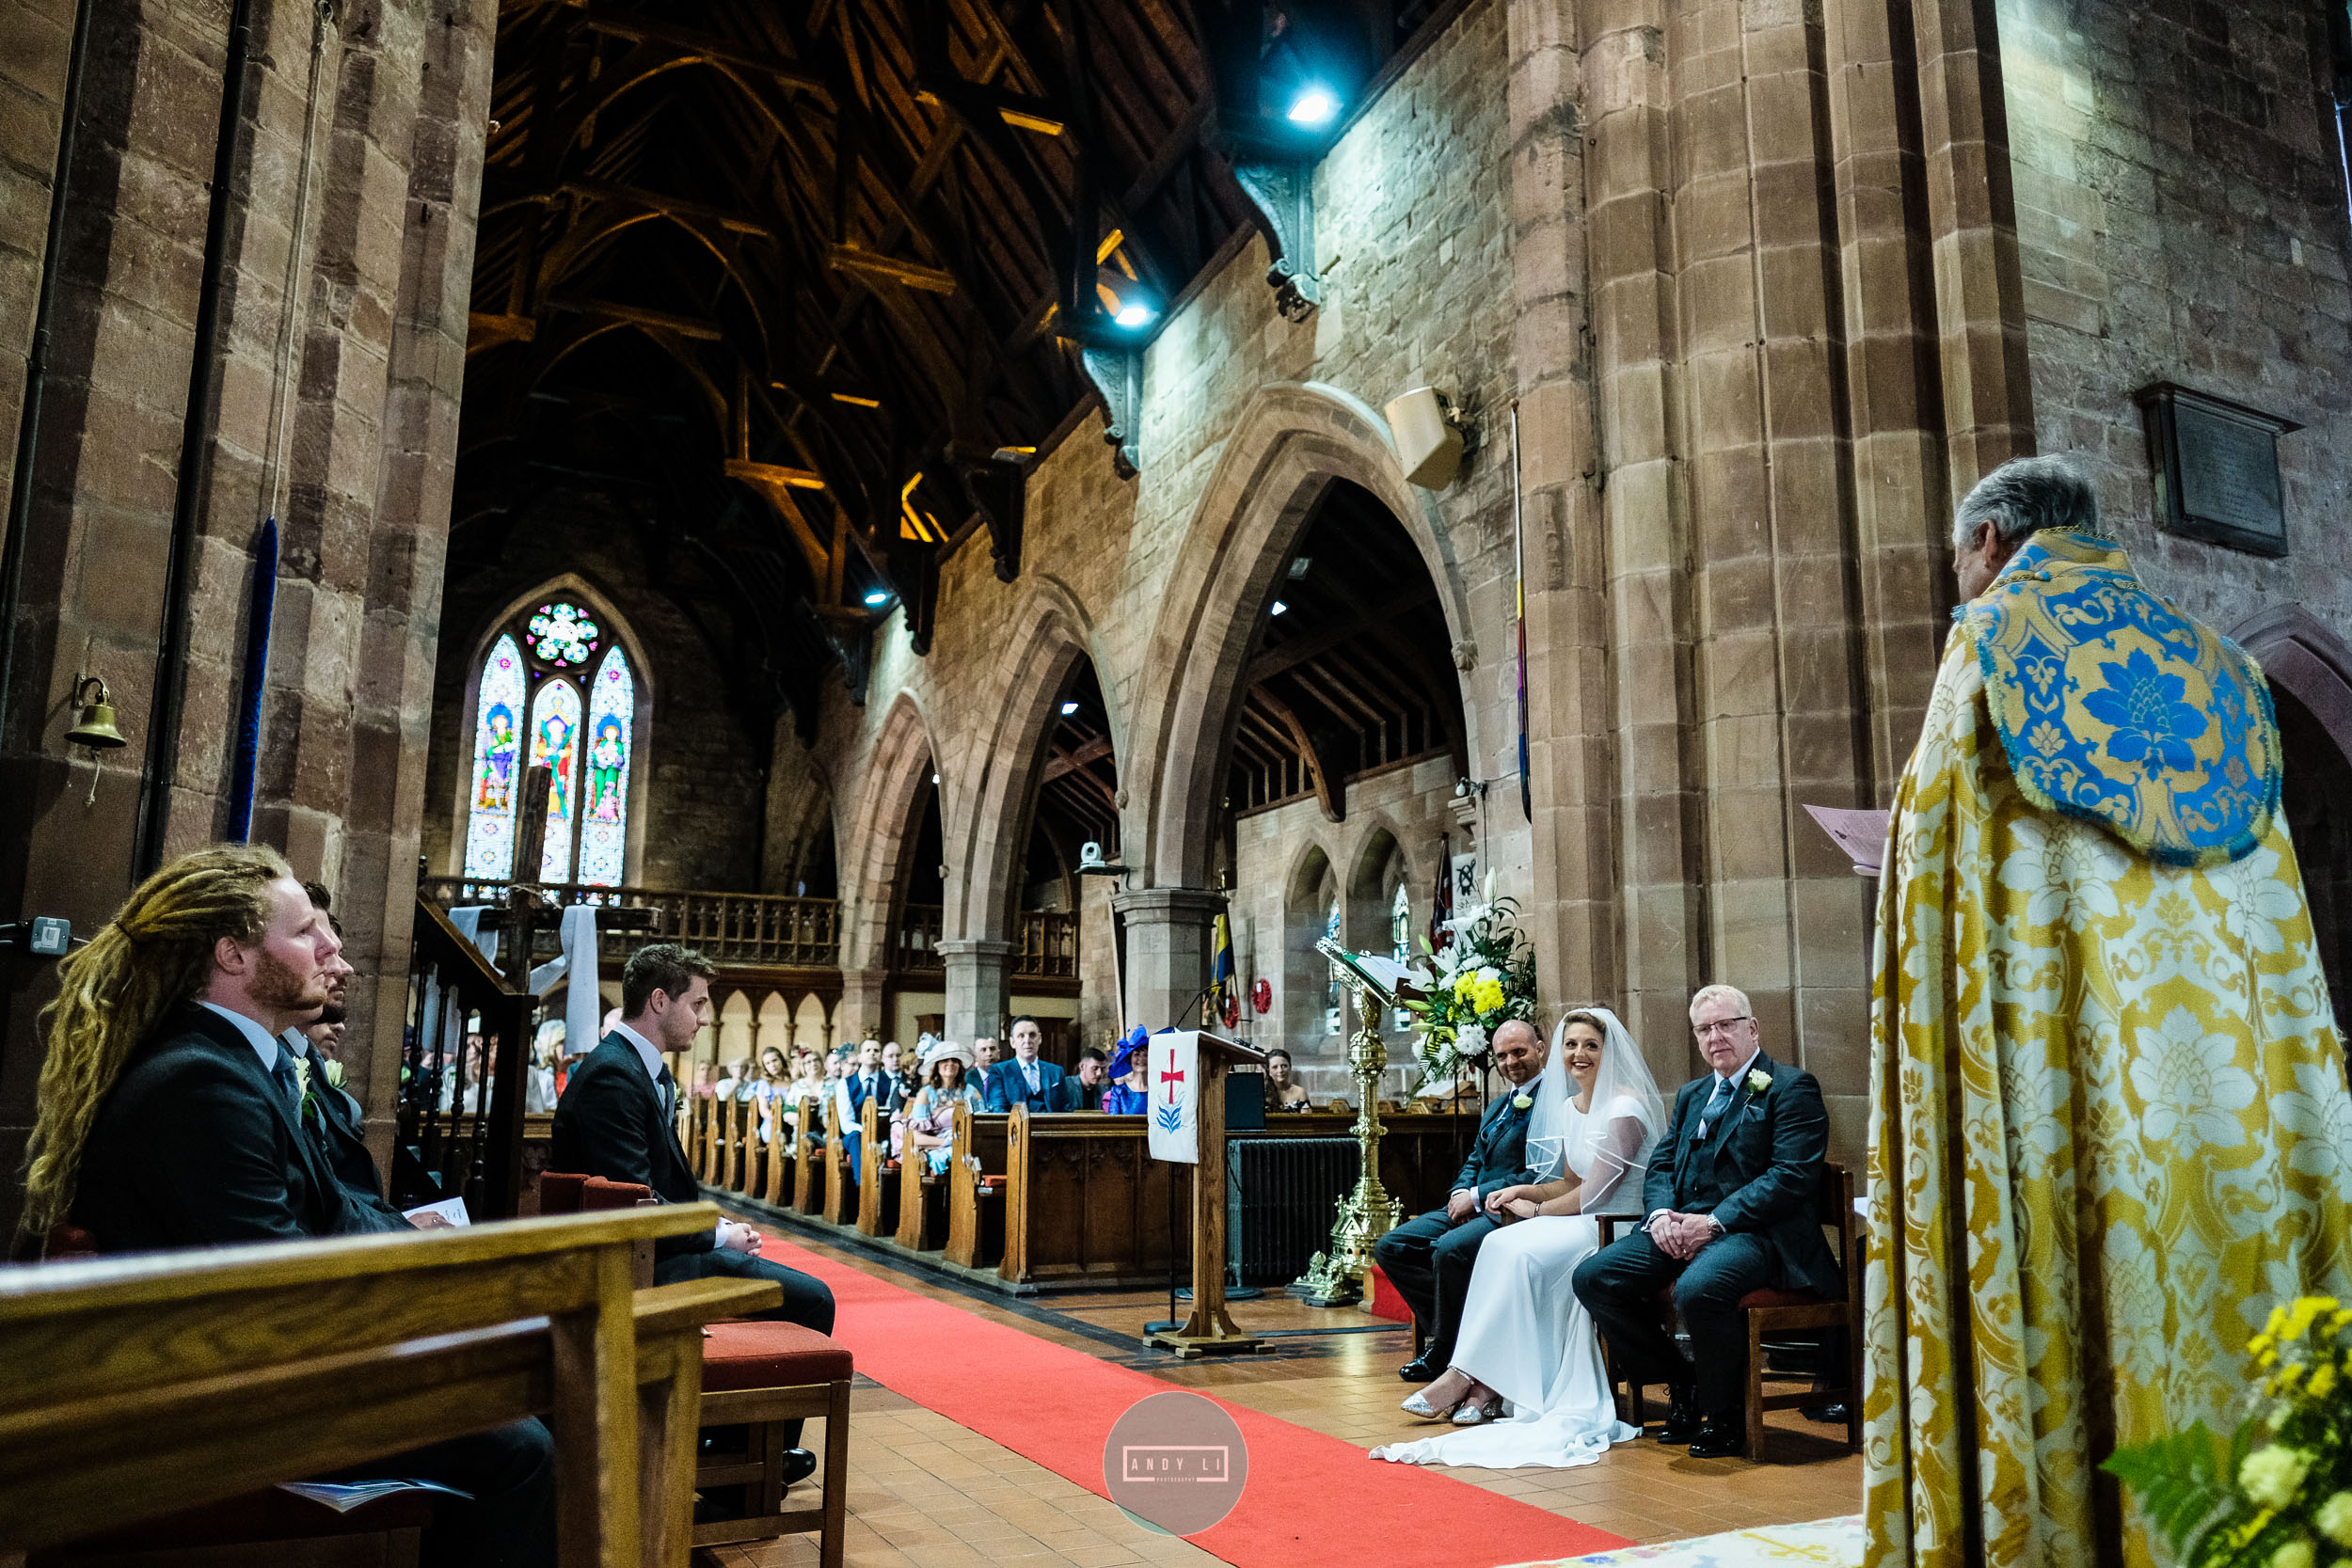 Lilleshall Hall Wedding Photographer-027-XPRO0663.jpg